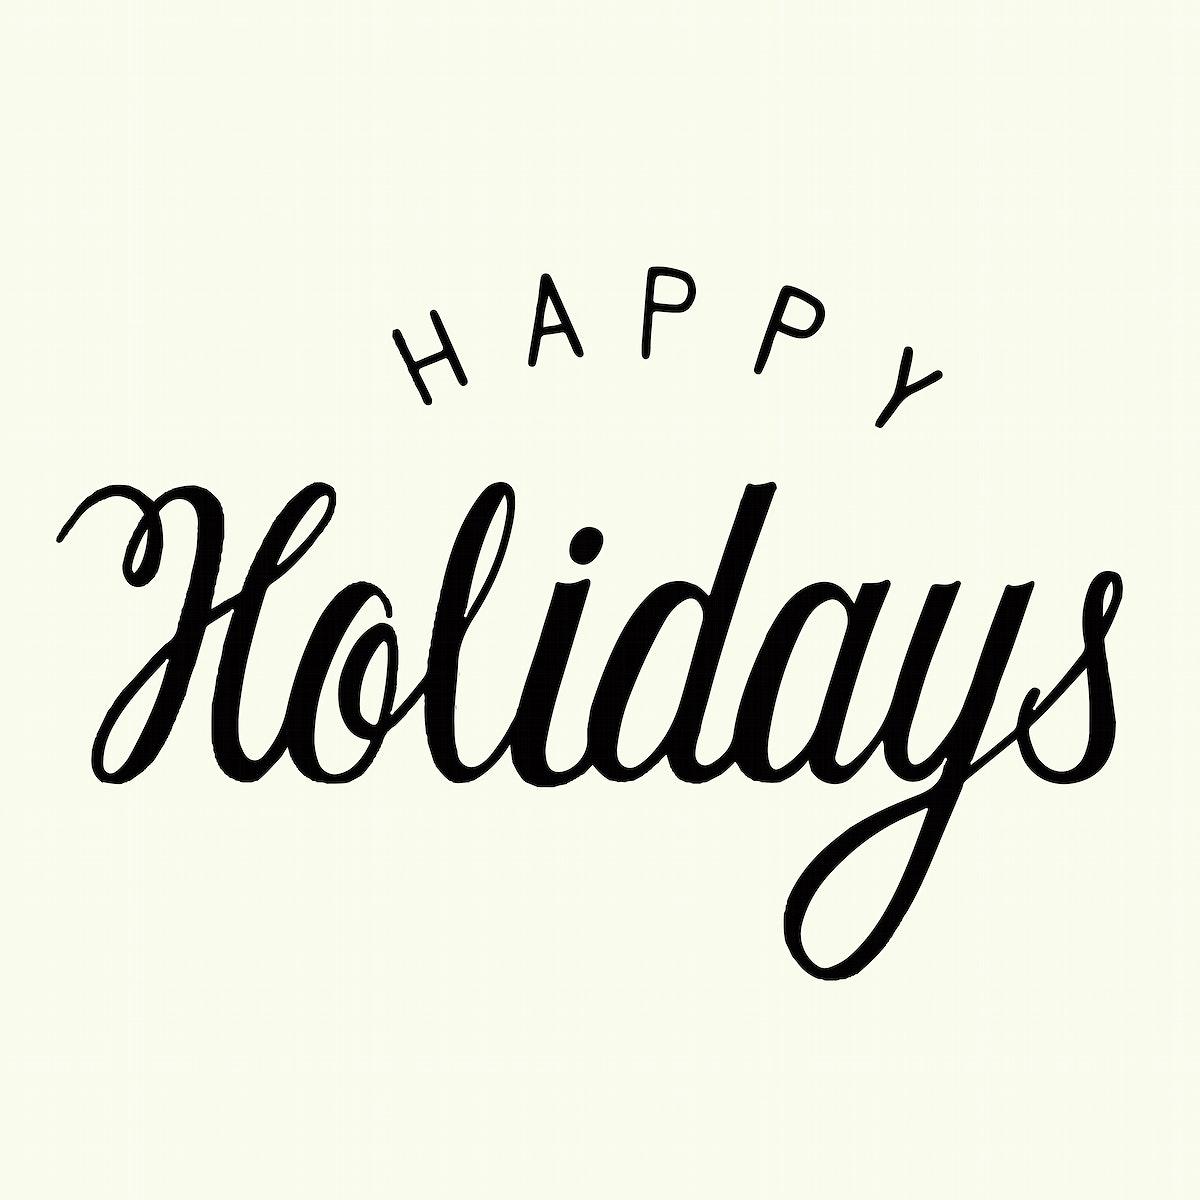 Handwritten style Happy Holidays typography